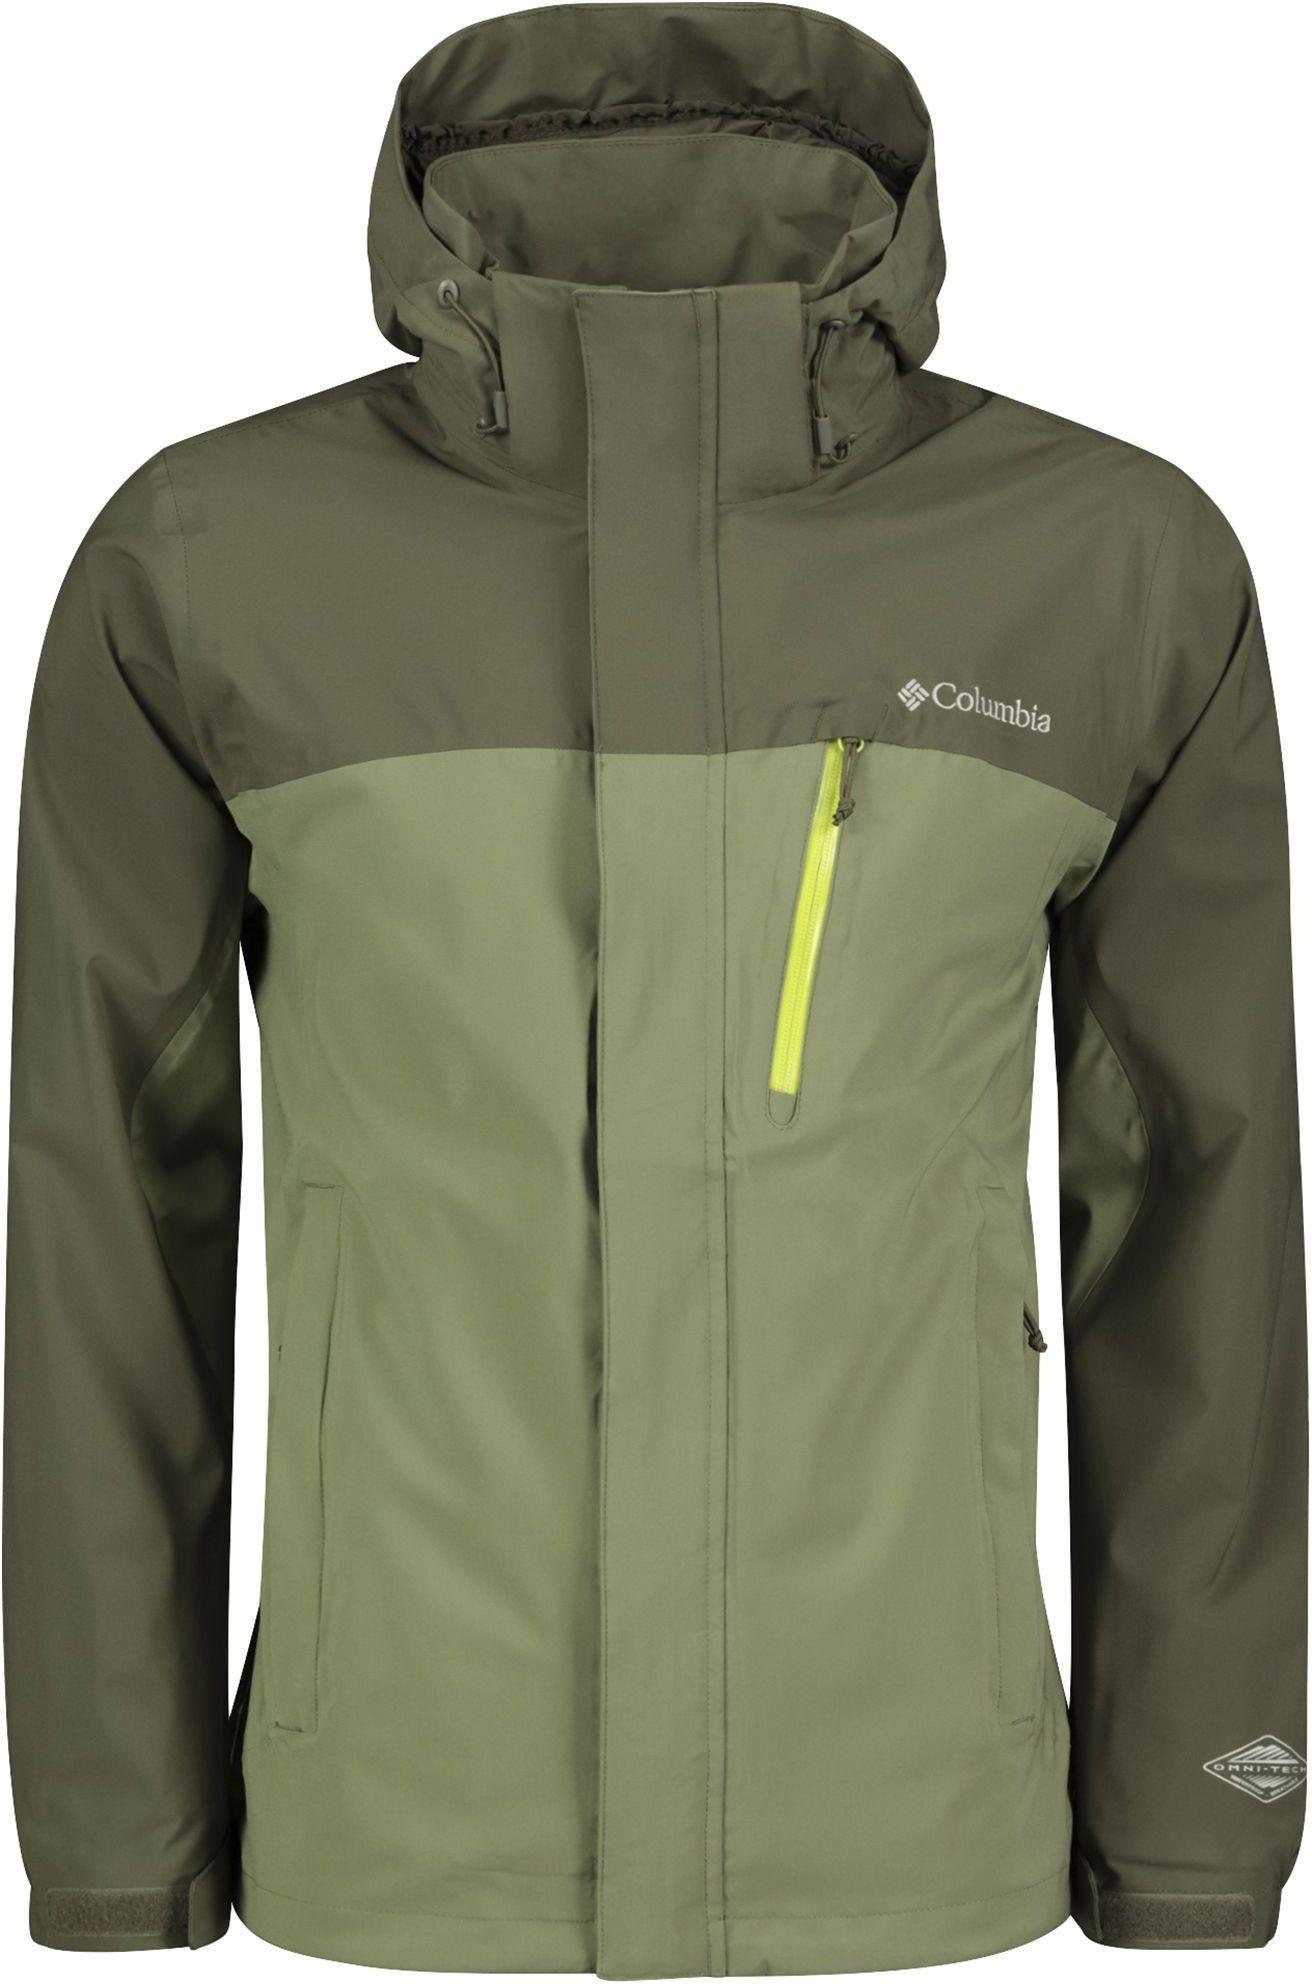 8d023e46 Best pris på Columbia Whidbey Island Jacket (Herre) - Se priser før kjøp i  Prisguiden